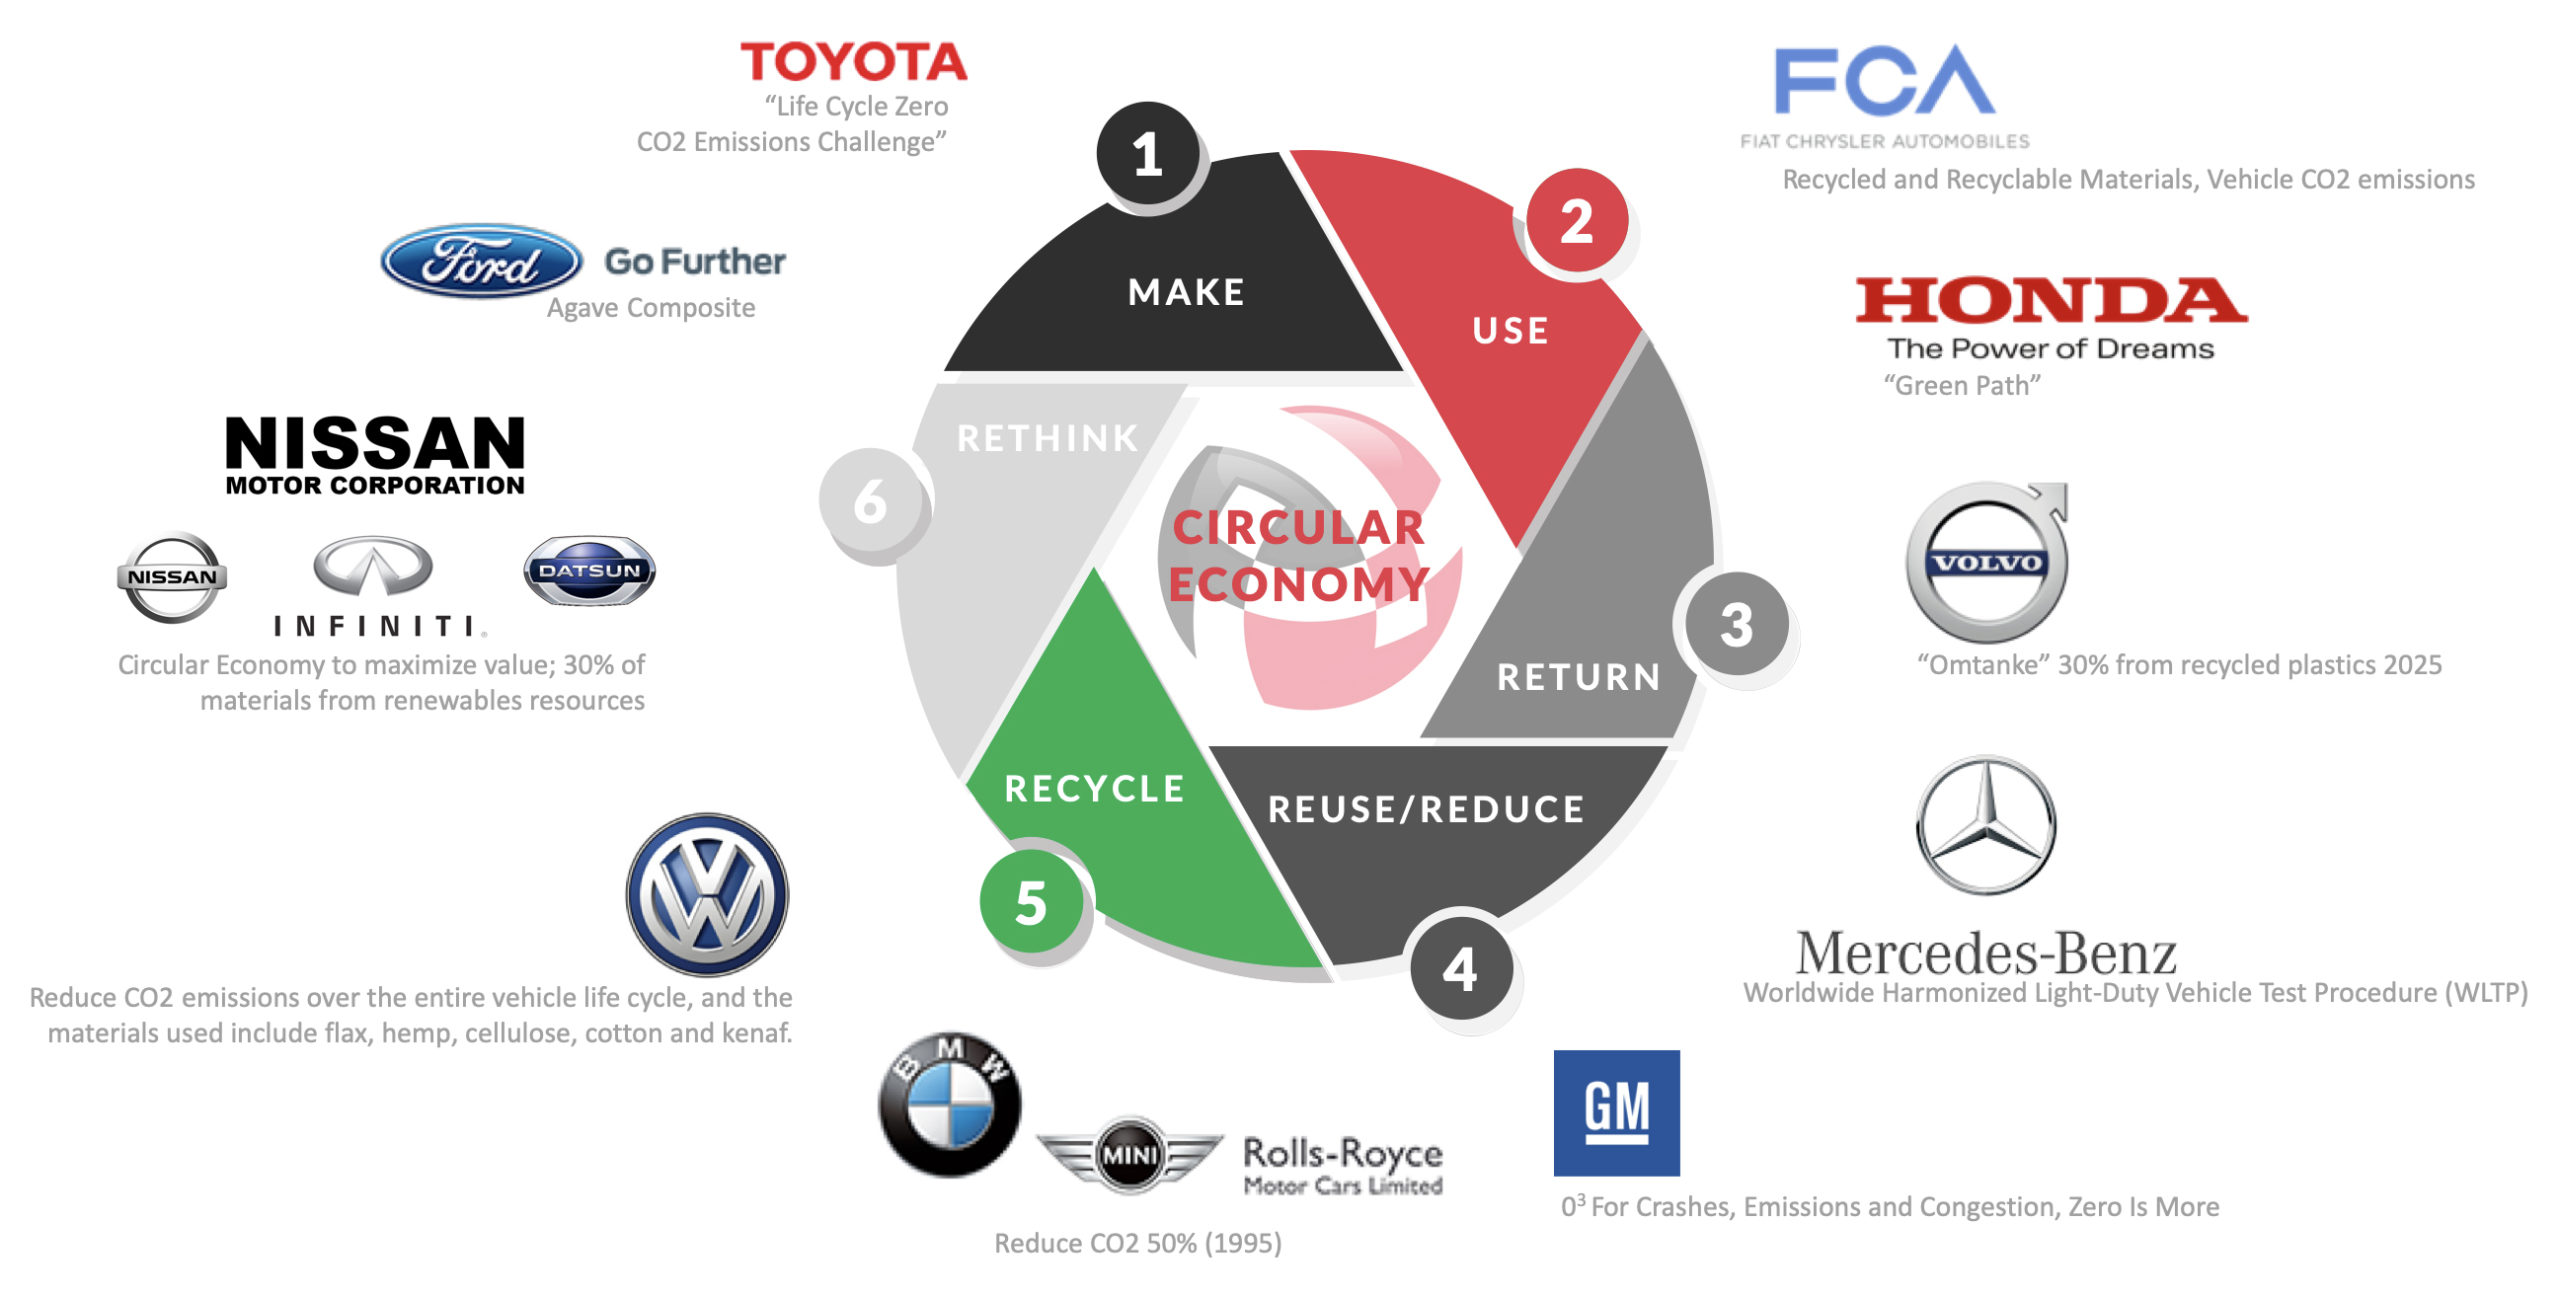 Circular Economy Adapt Advanced Plastic Technologies